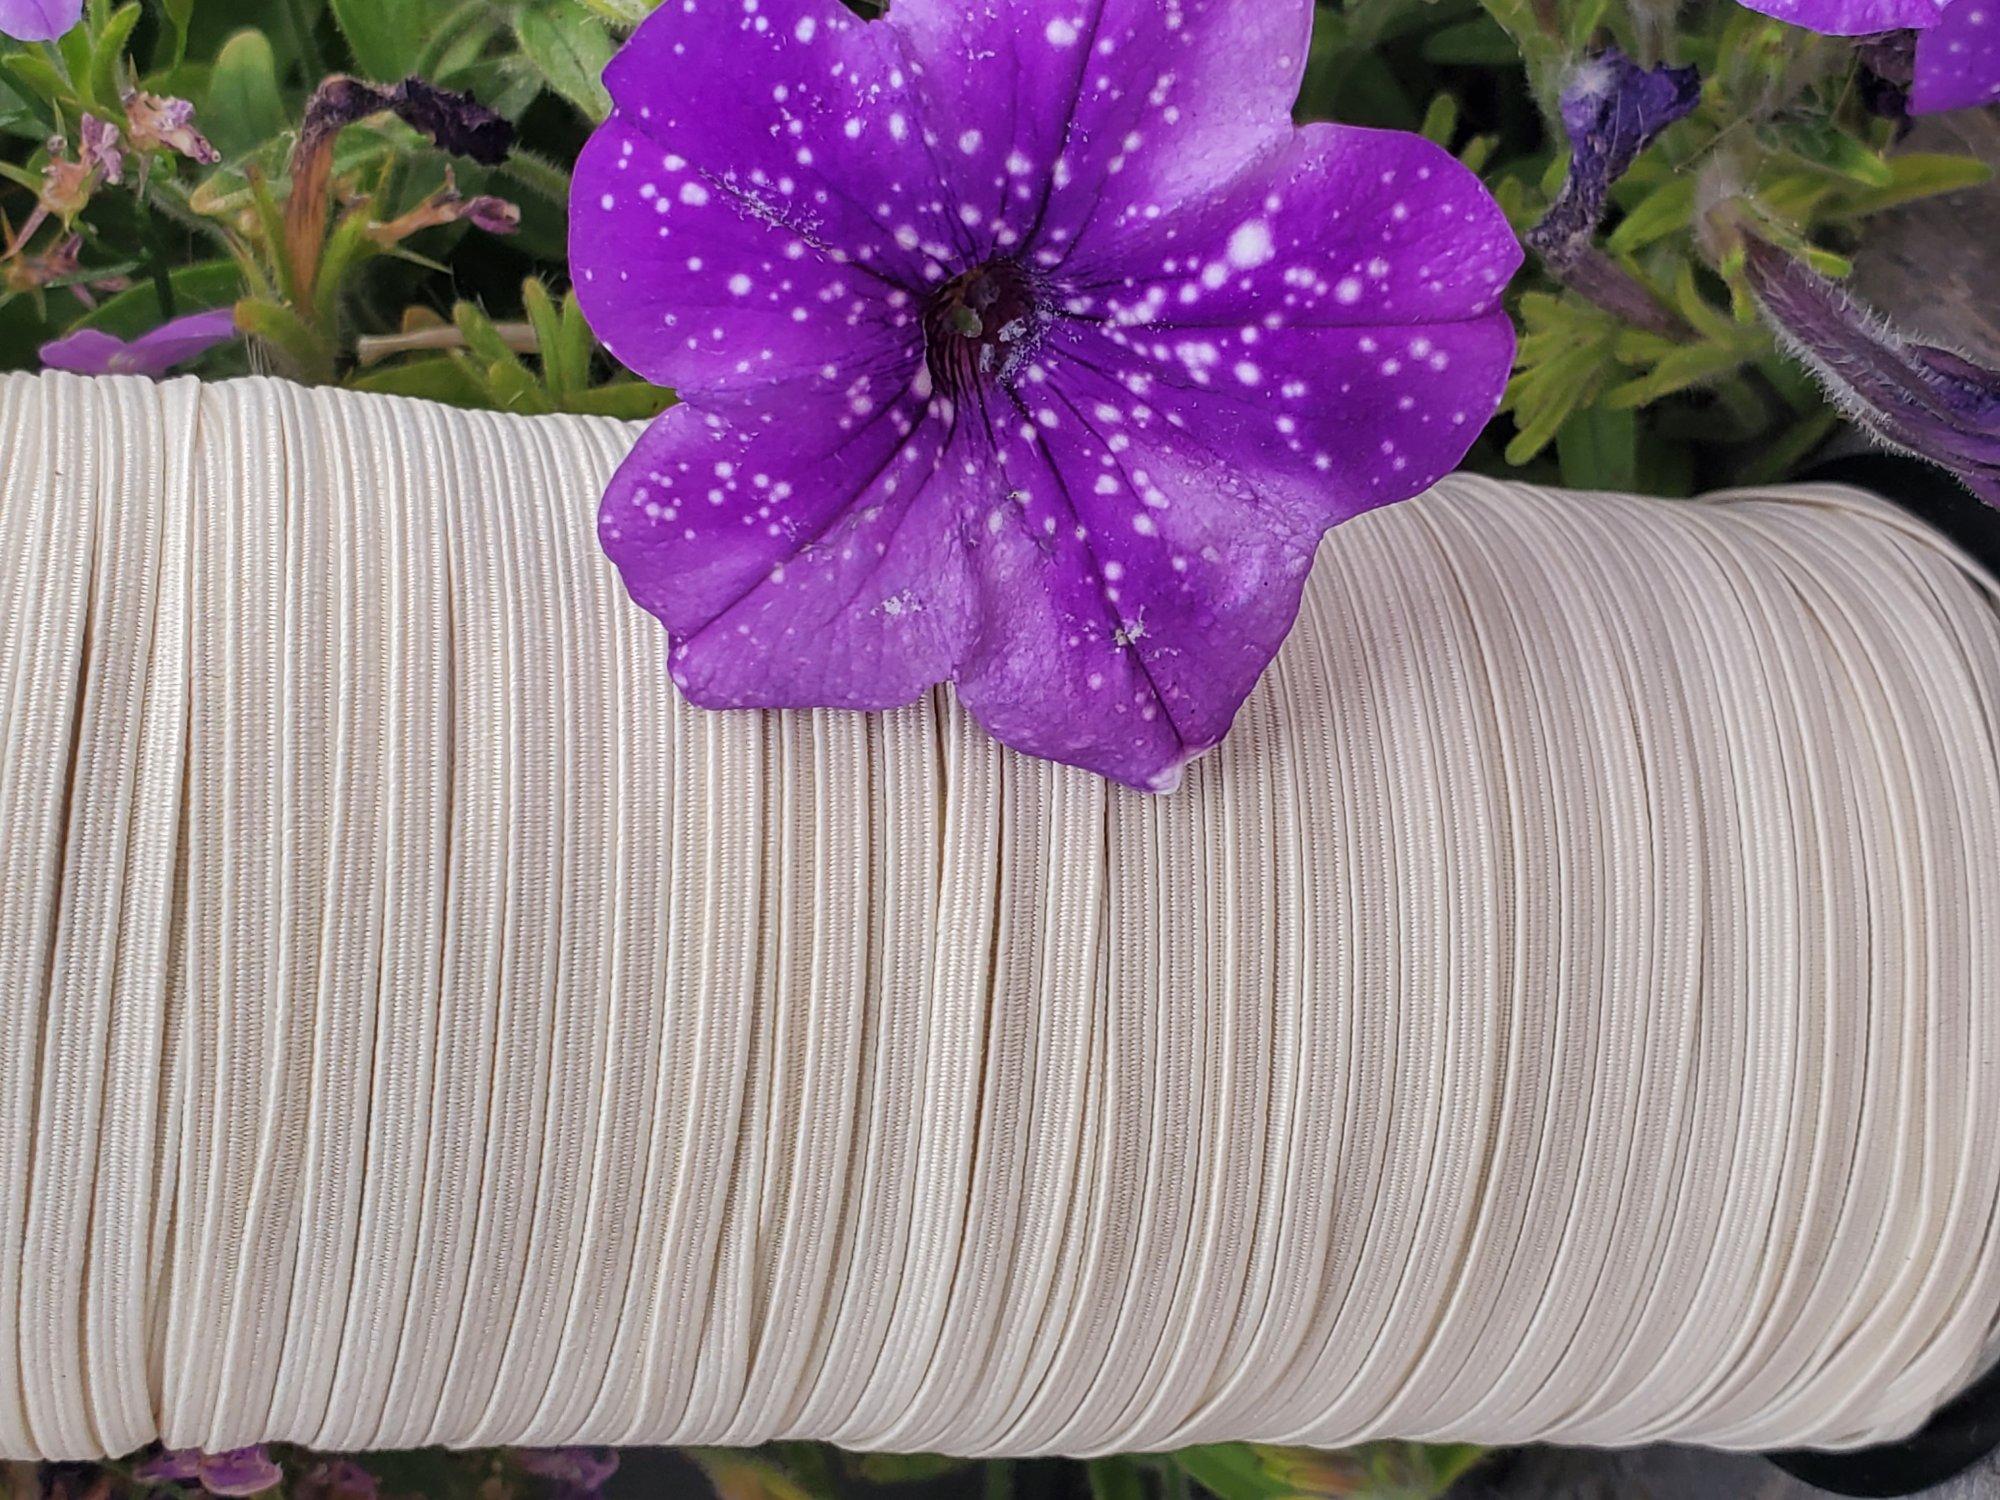 Cindy-rellas 1/8 inch (3mm) Elastic  - Cream